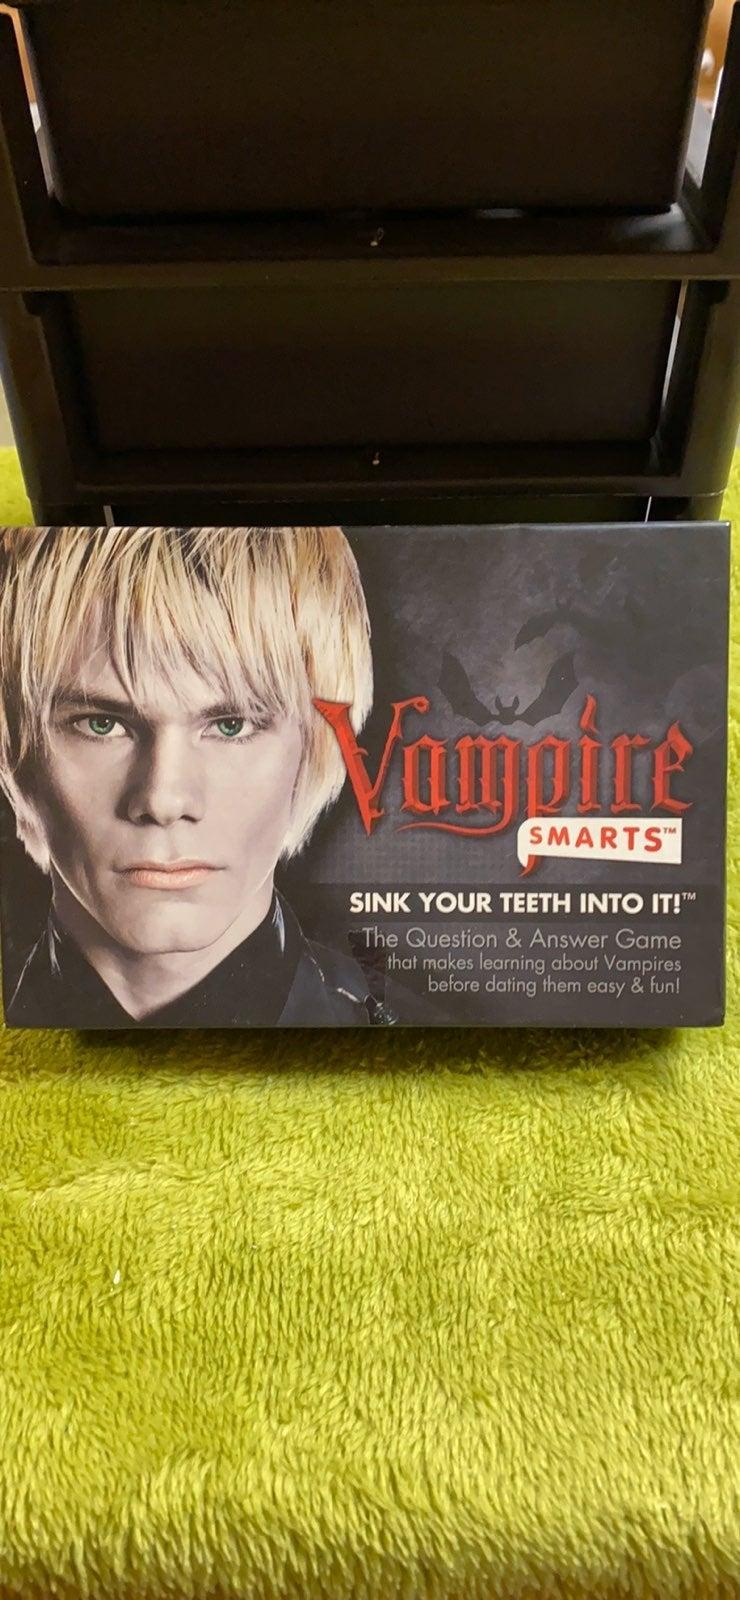 Vampire smarts trivia game